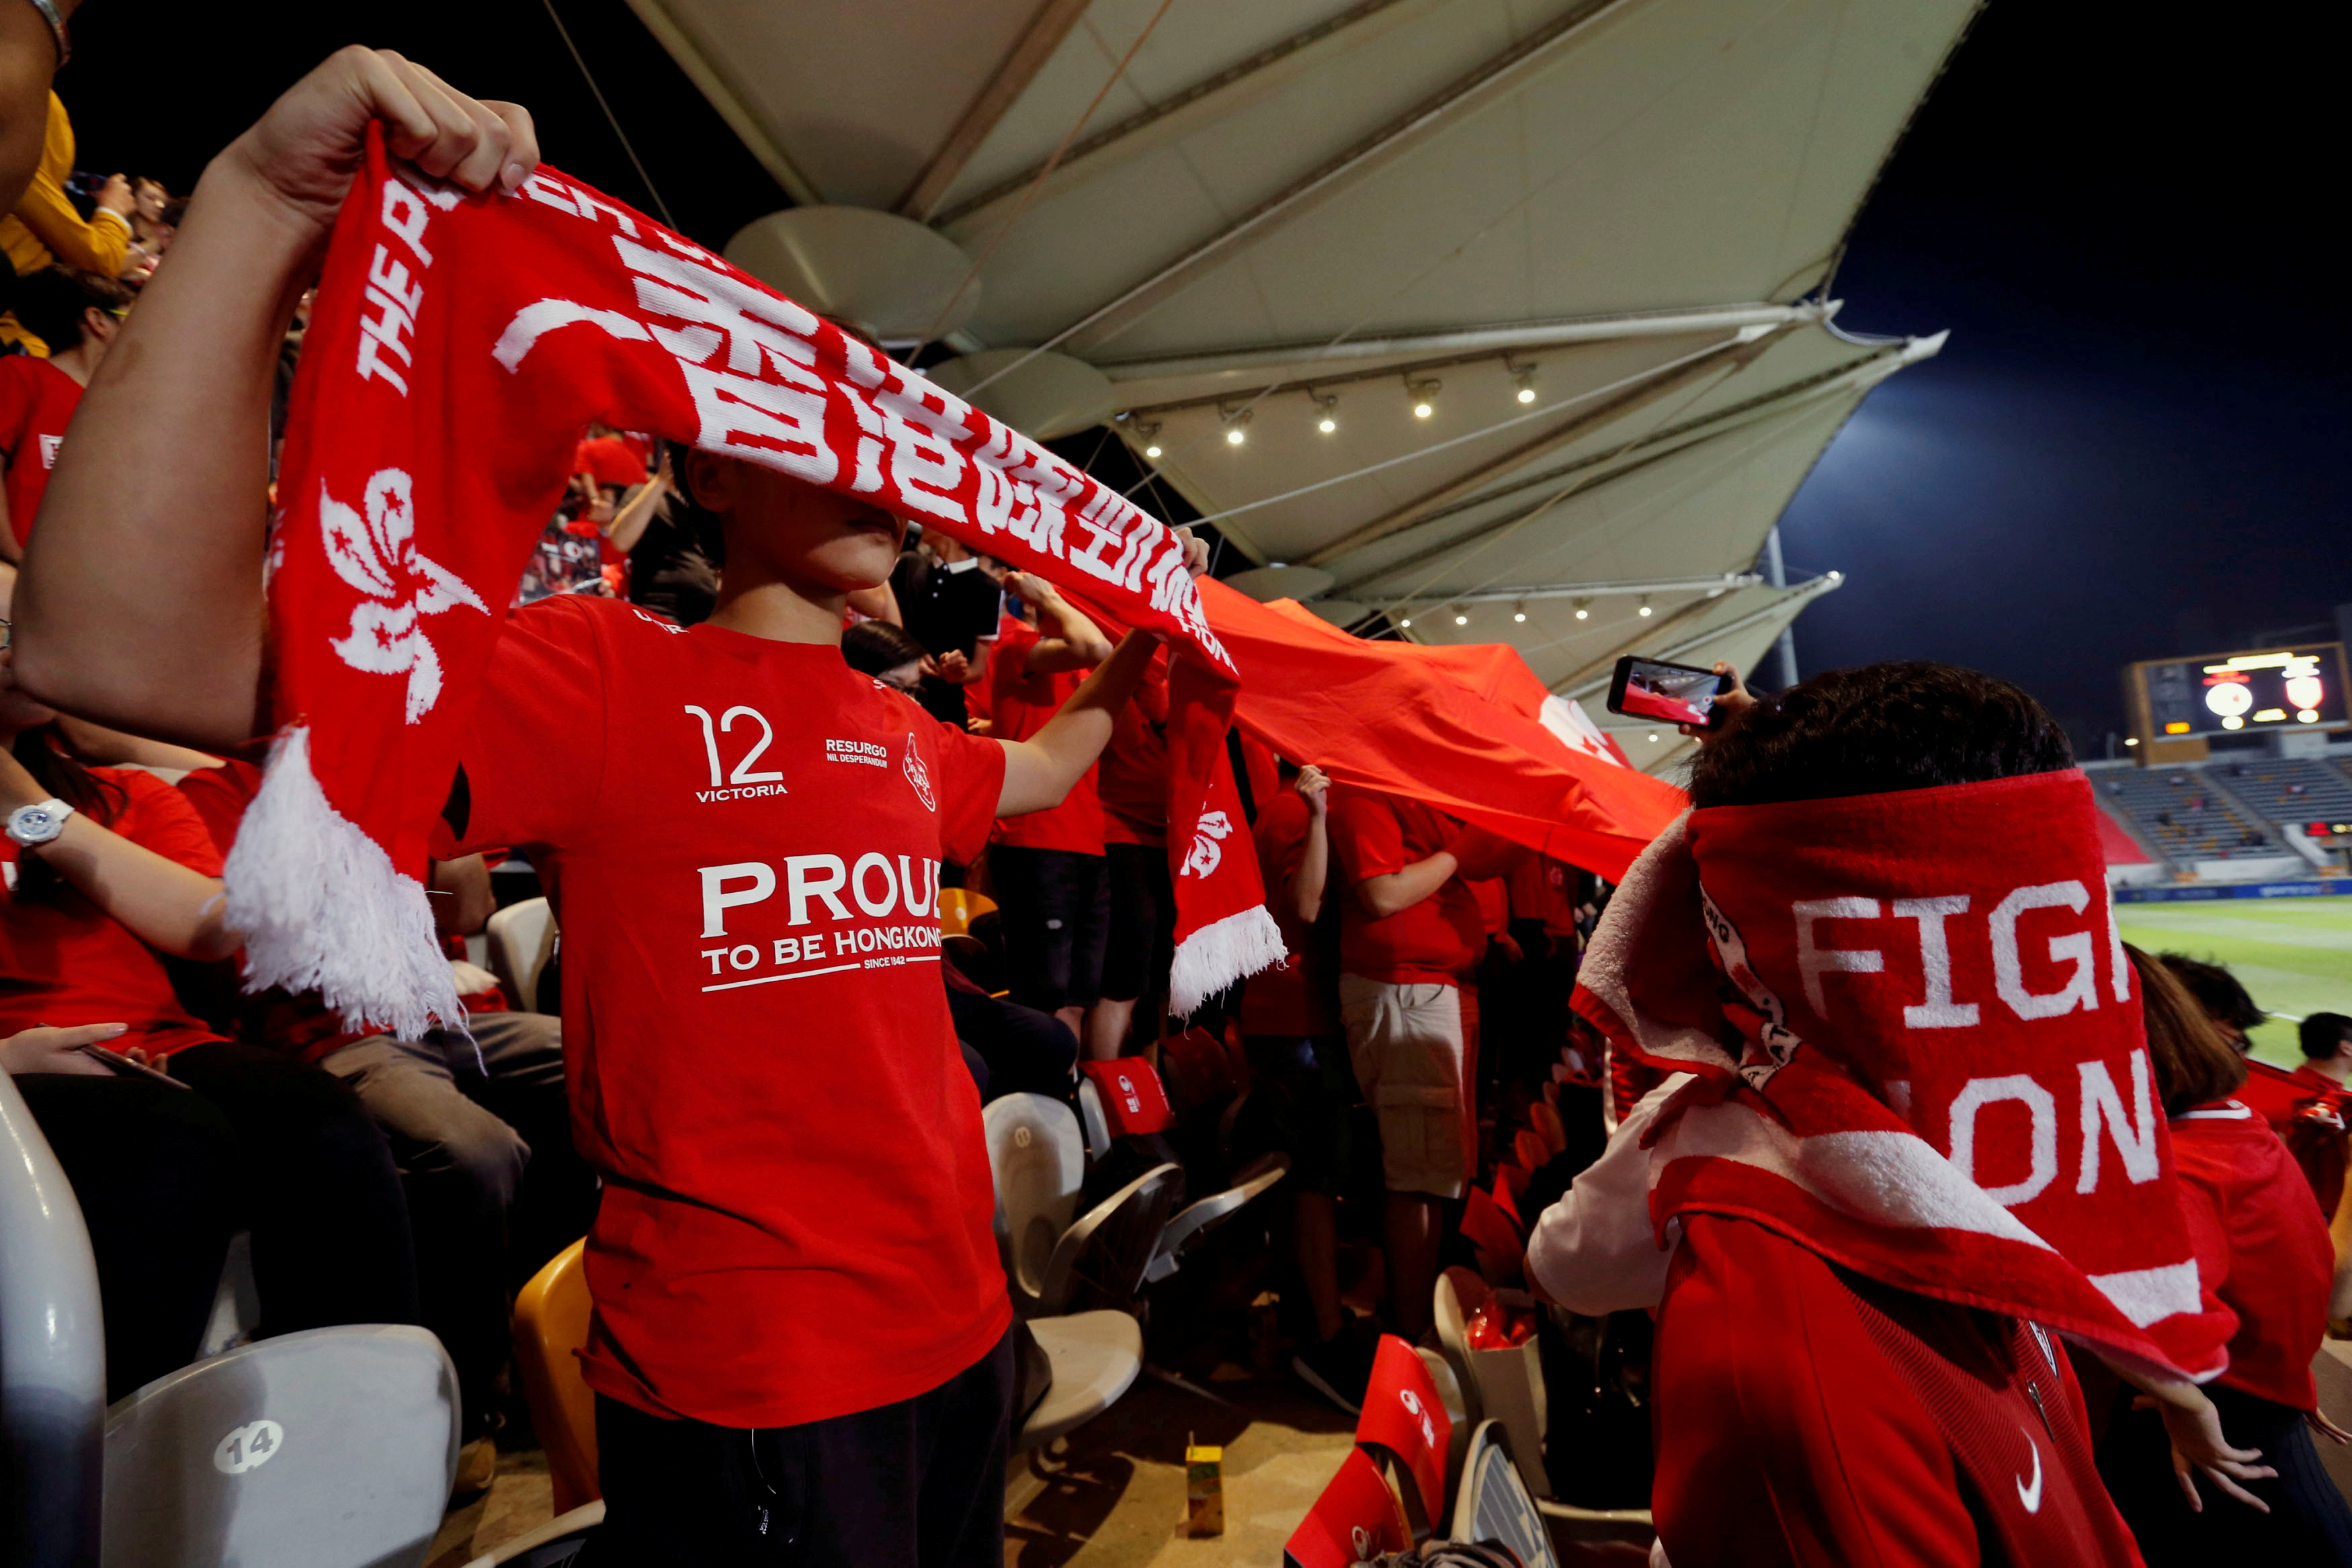 Hong Kong fans cover their faces and boo during the Chinese national anthem, at a friendly soccer match between Hong Kong and Bahrain in Hong Kong, China, November 9, 2017.